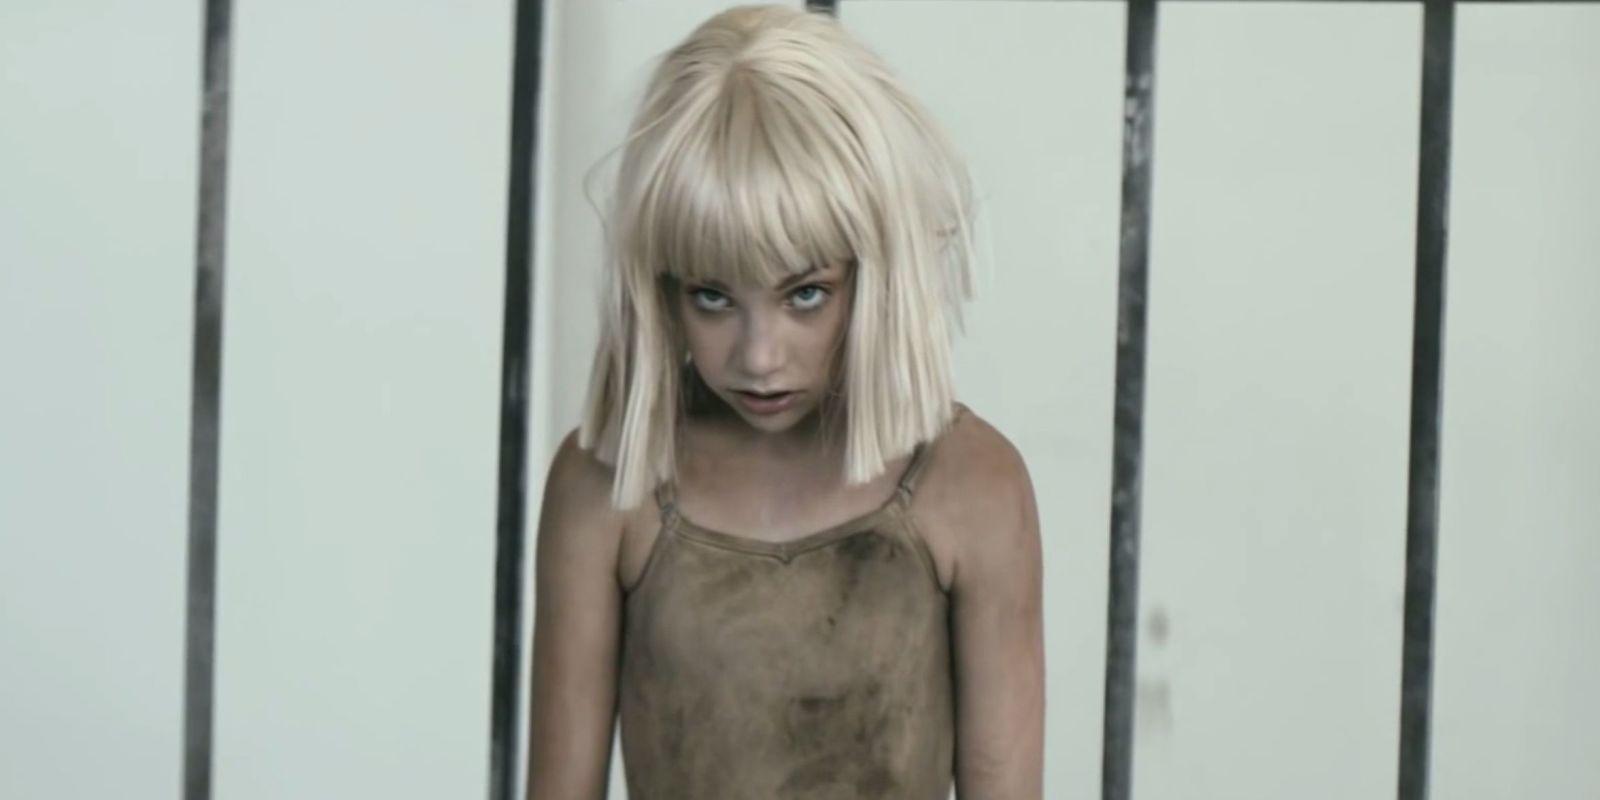 Maddie ziegler nude Maddie Ziegler, Naked Shia LaBeouf Star in Sia's New Music Video